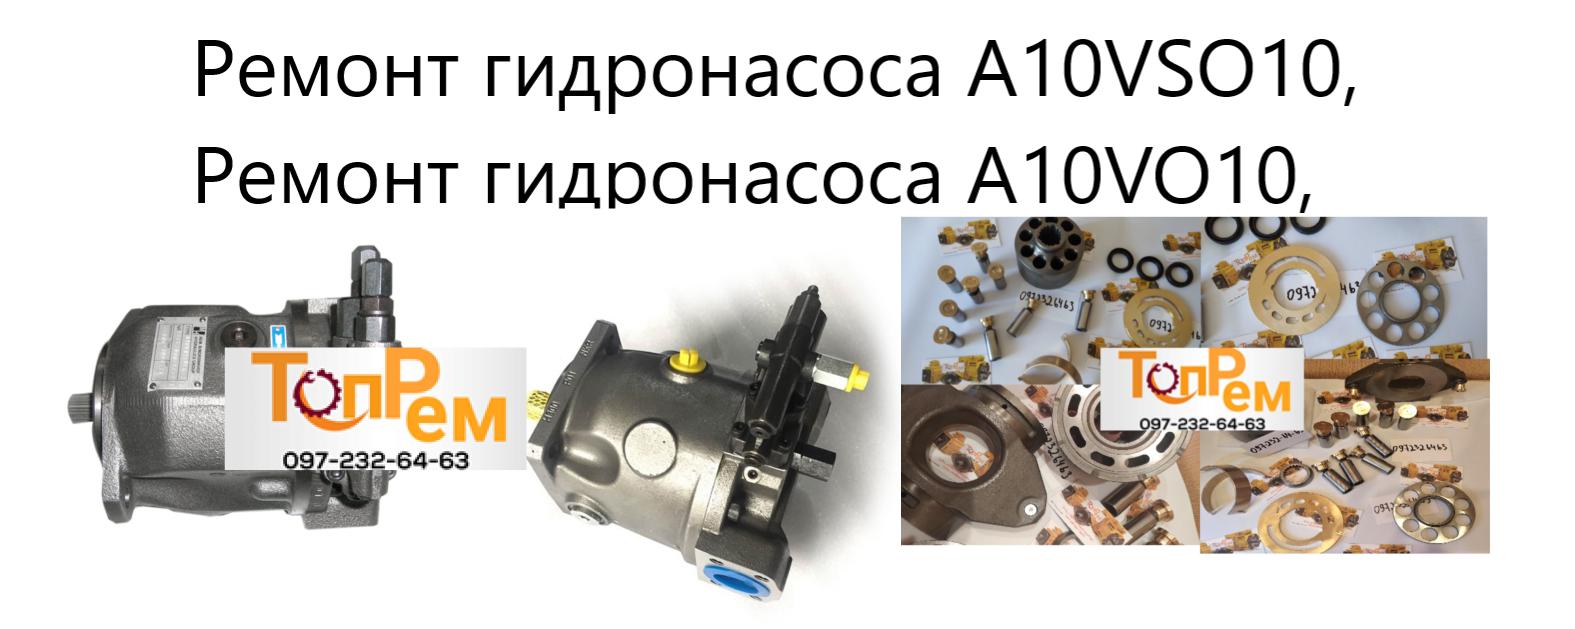 Ремонт гидронасоса A10VSO10